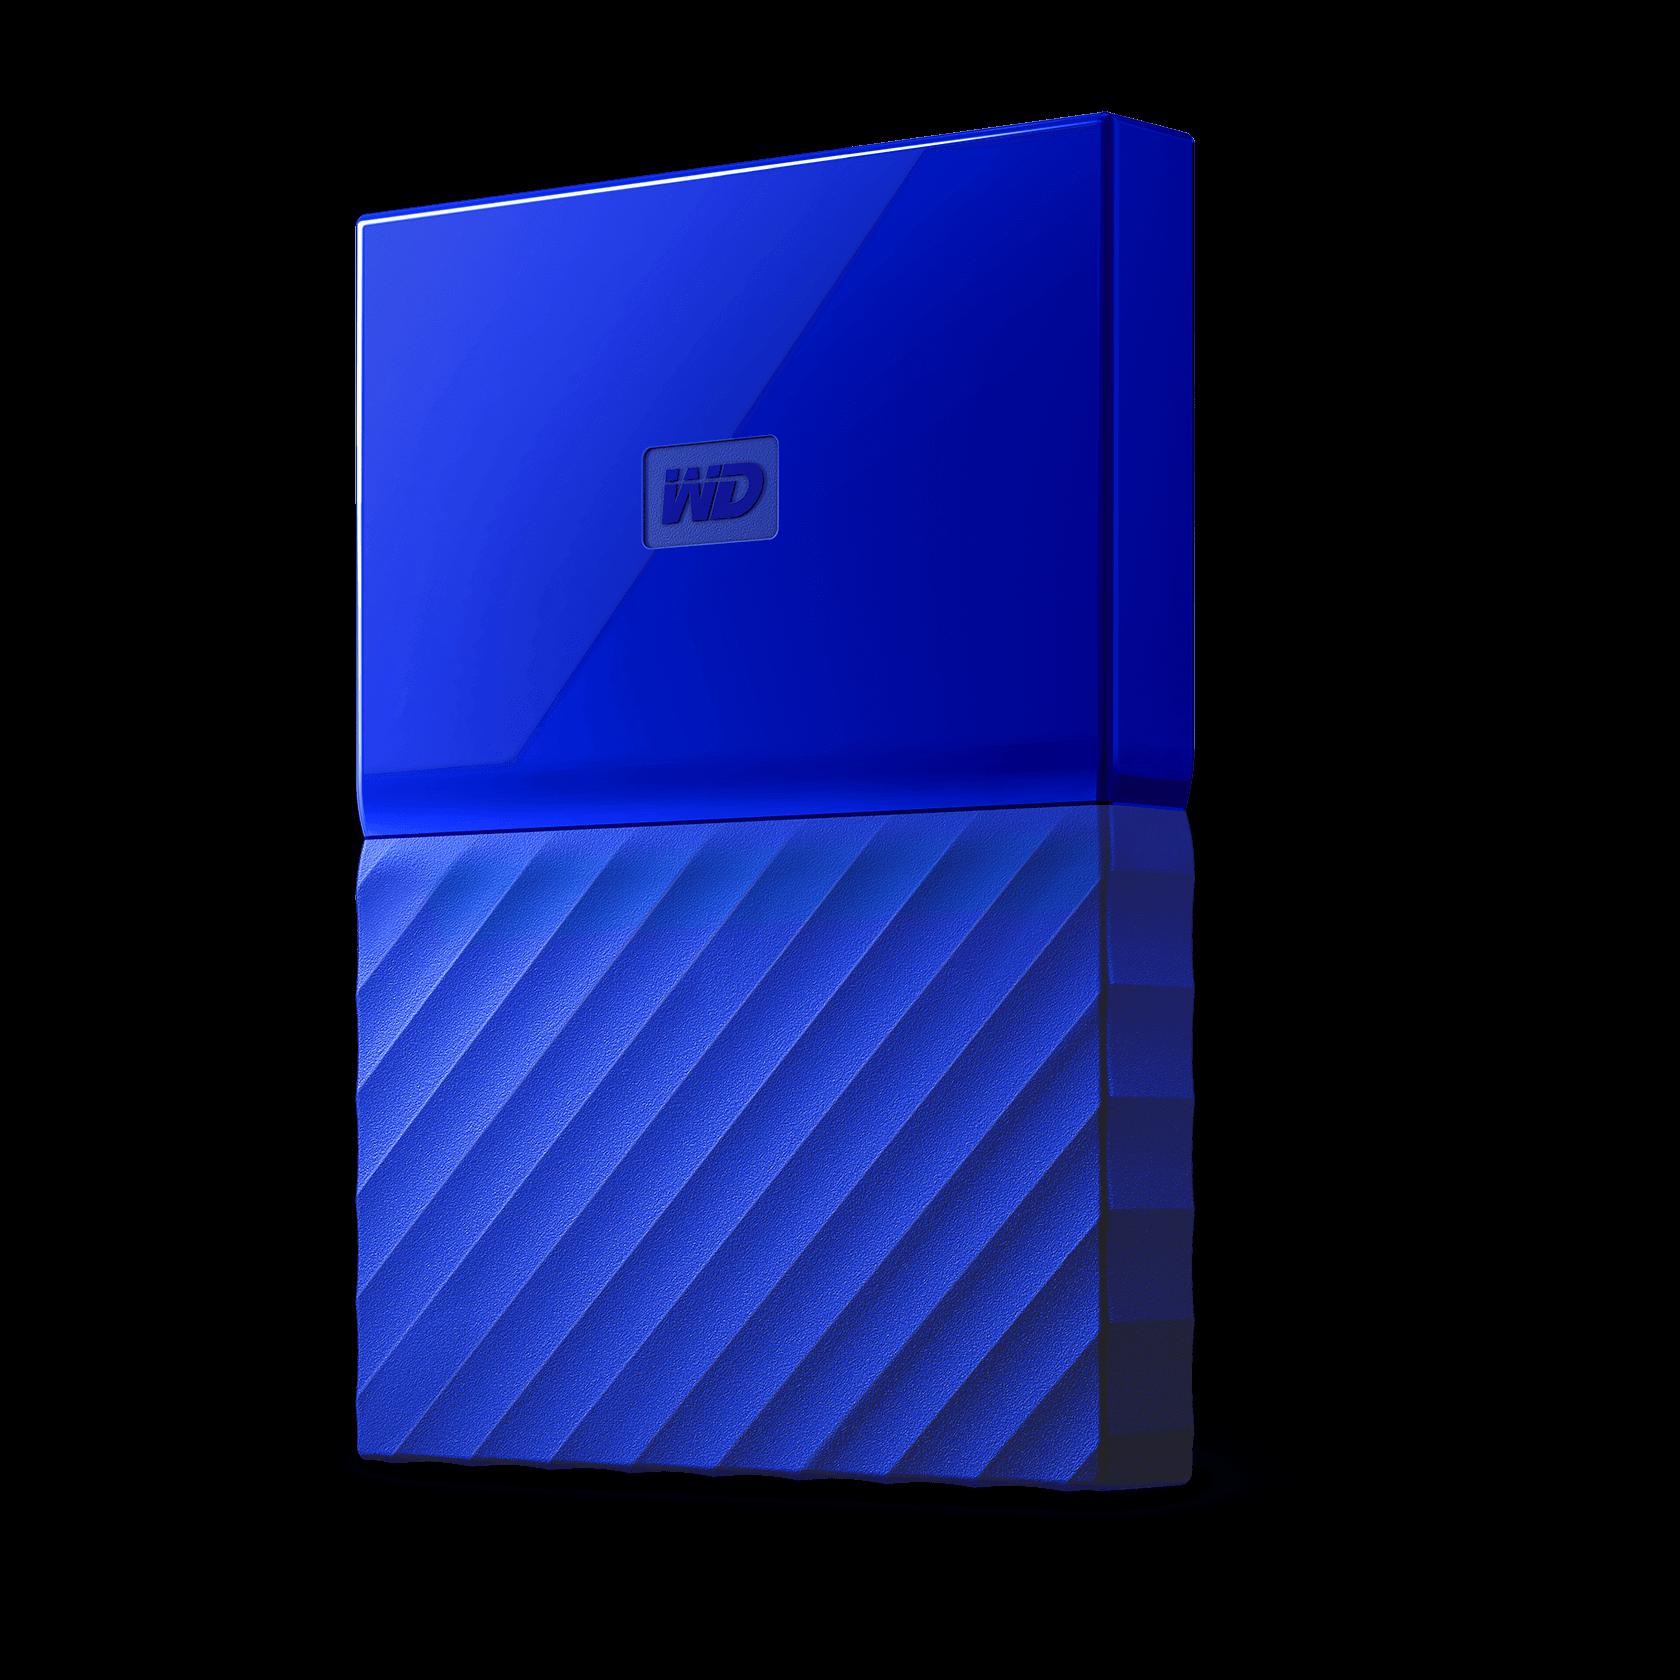 WD My Passport 3TB Blue Manufacturer Refurbished Hard Drive by Western Digital